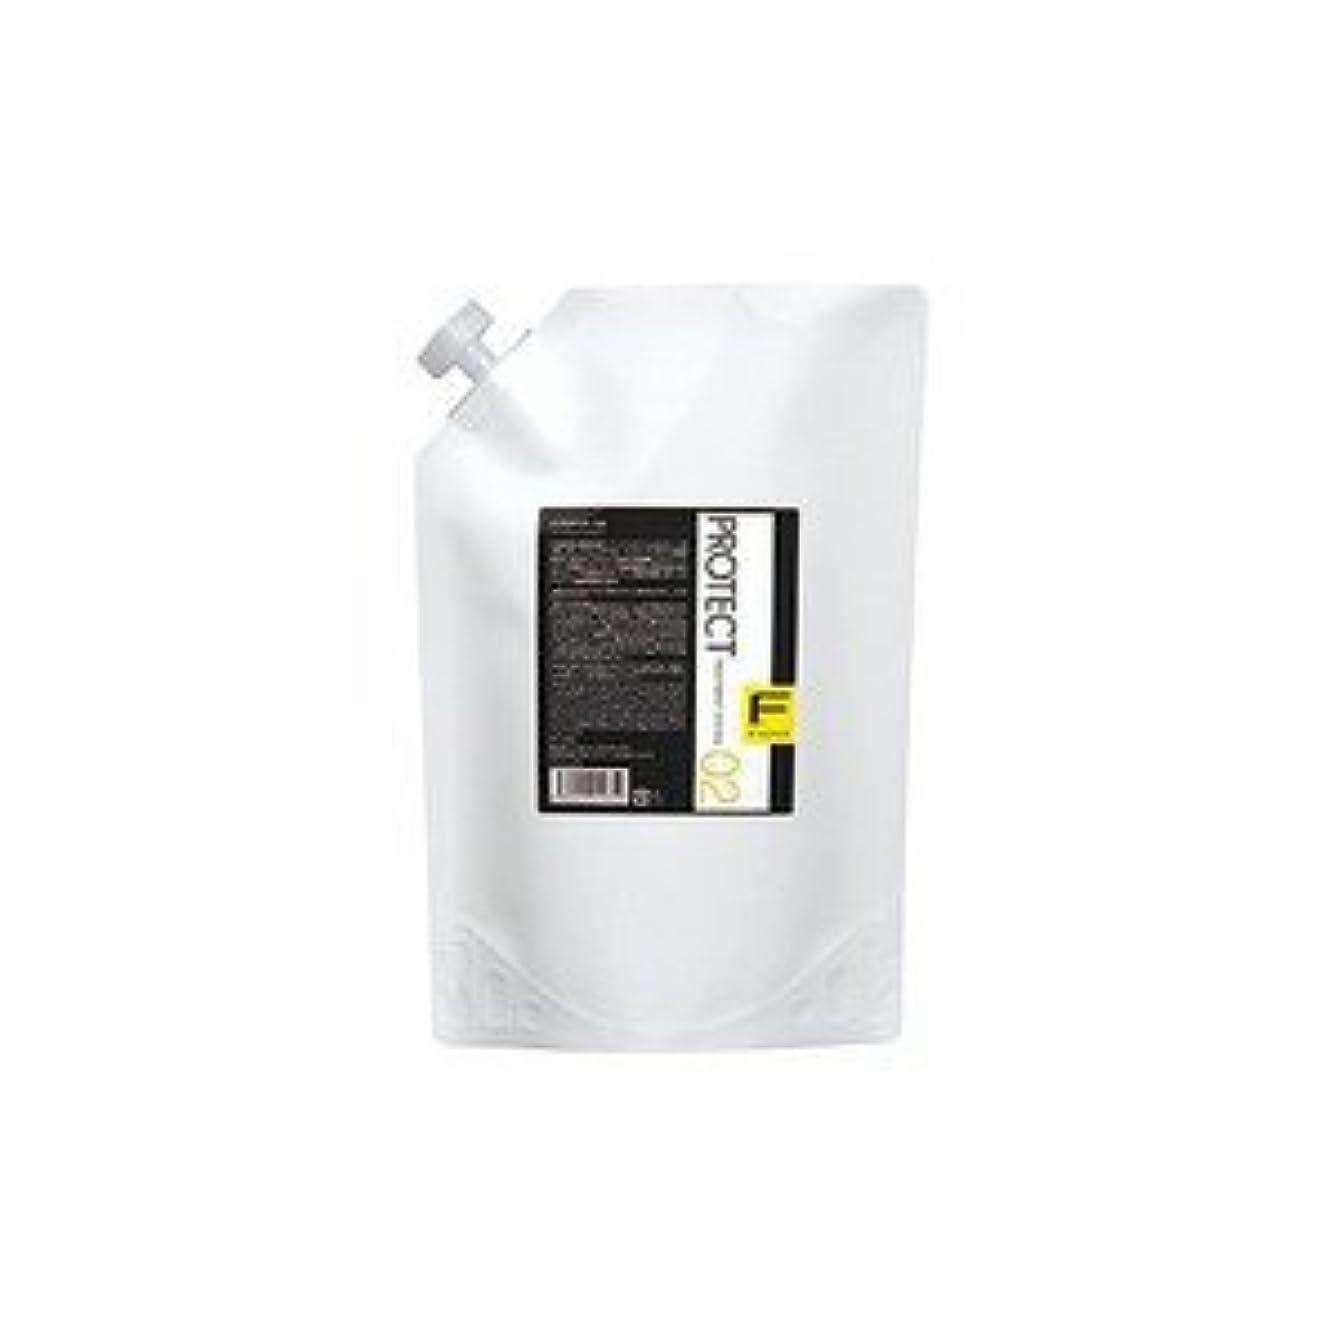 FIOLE フィヨーレ Fプロテクト02 トリートメントシステム 1500ml (業務用) 【国内正規品】